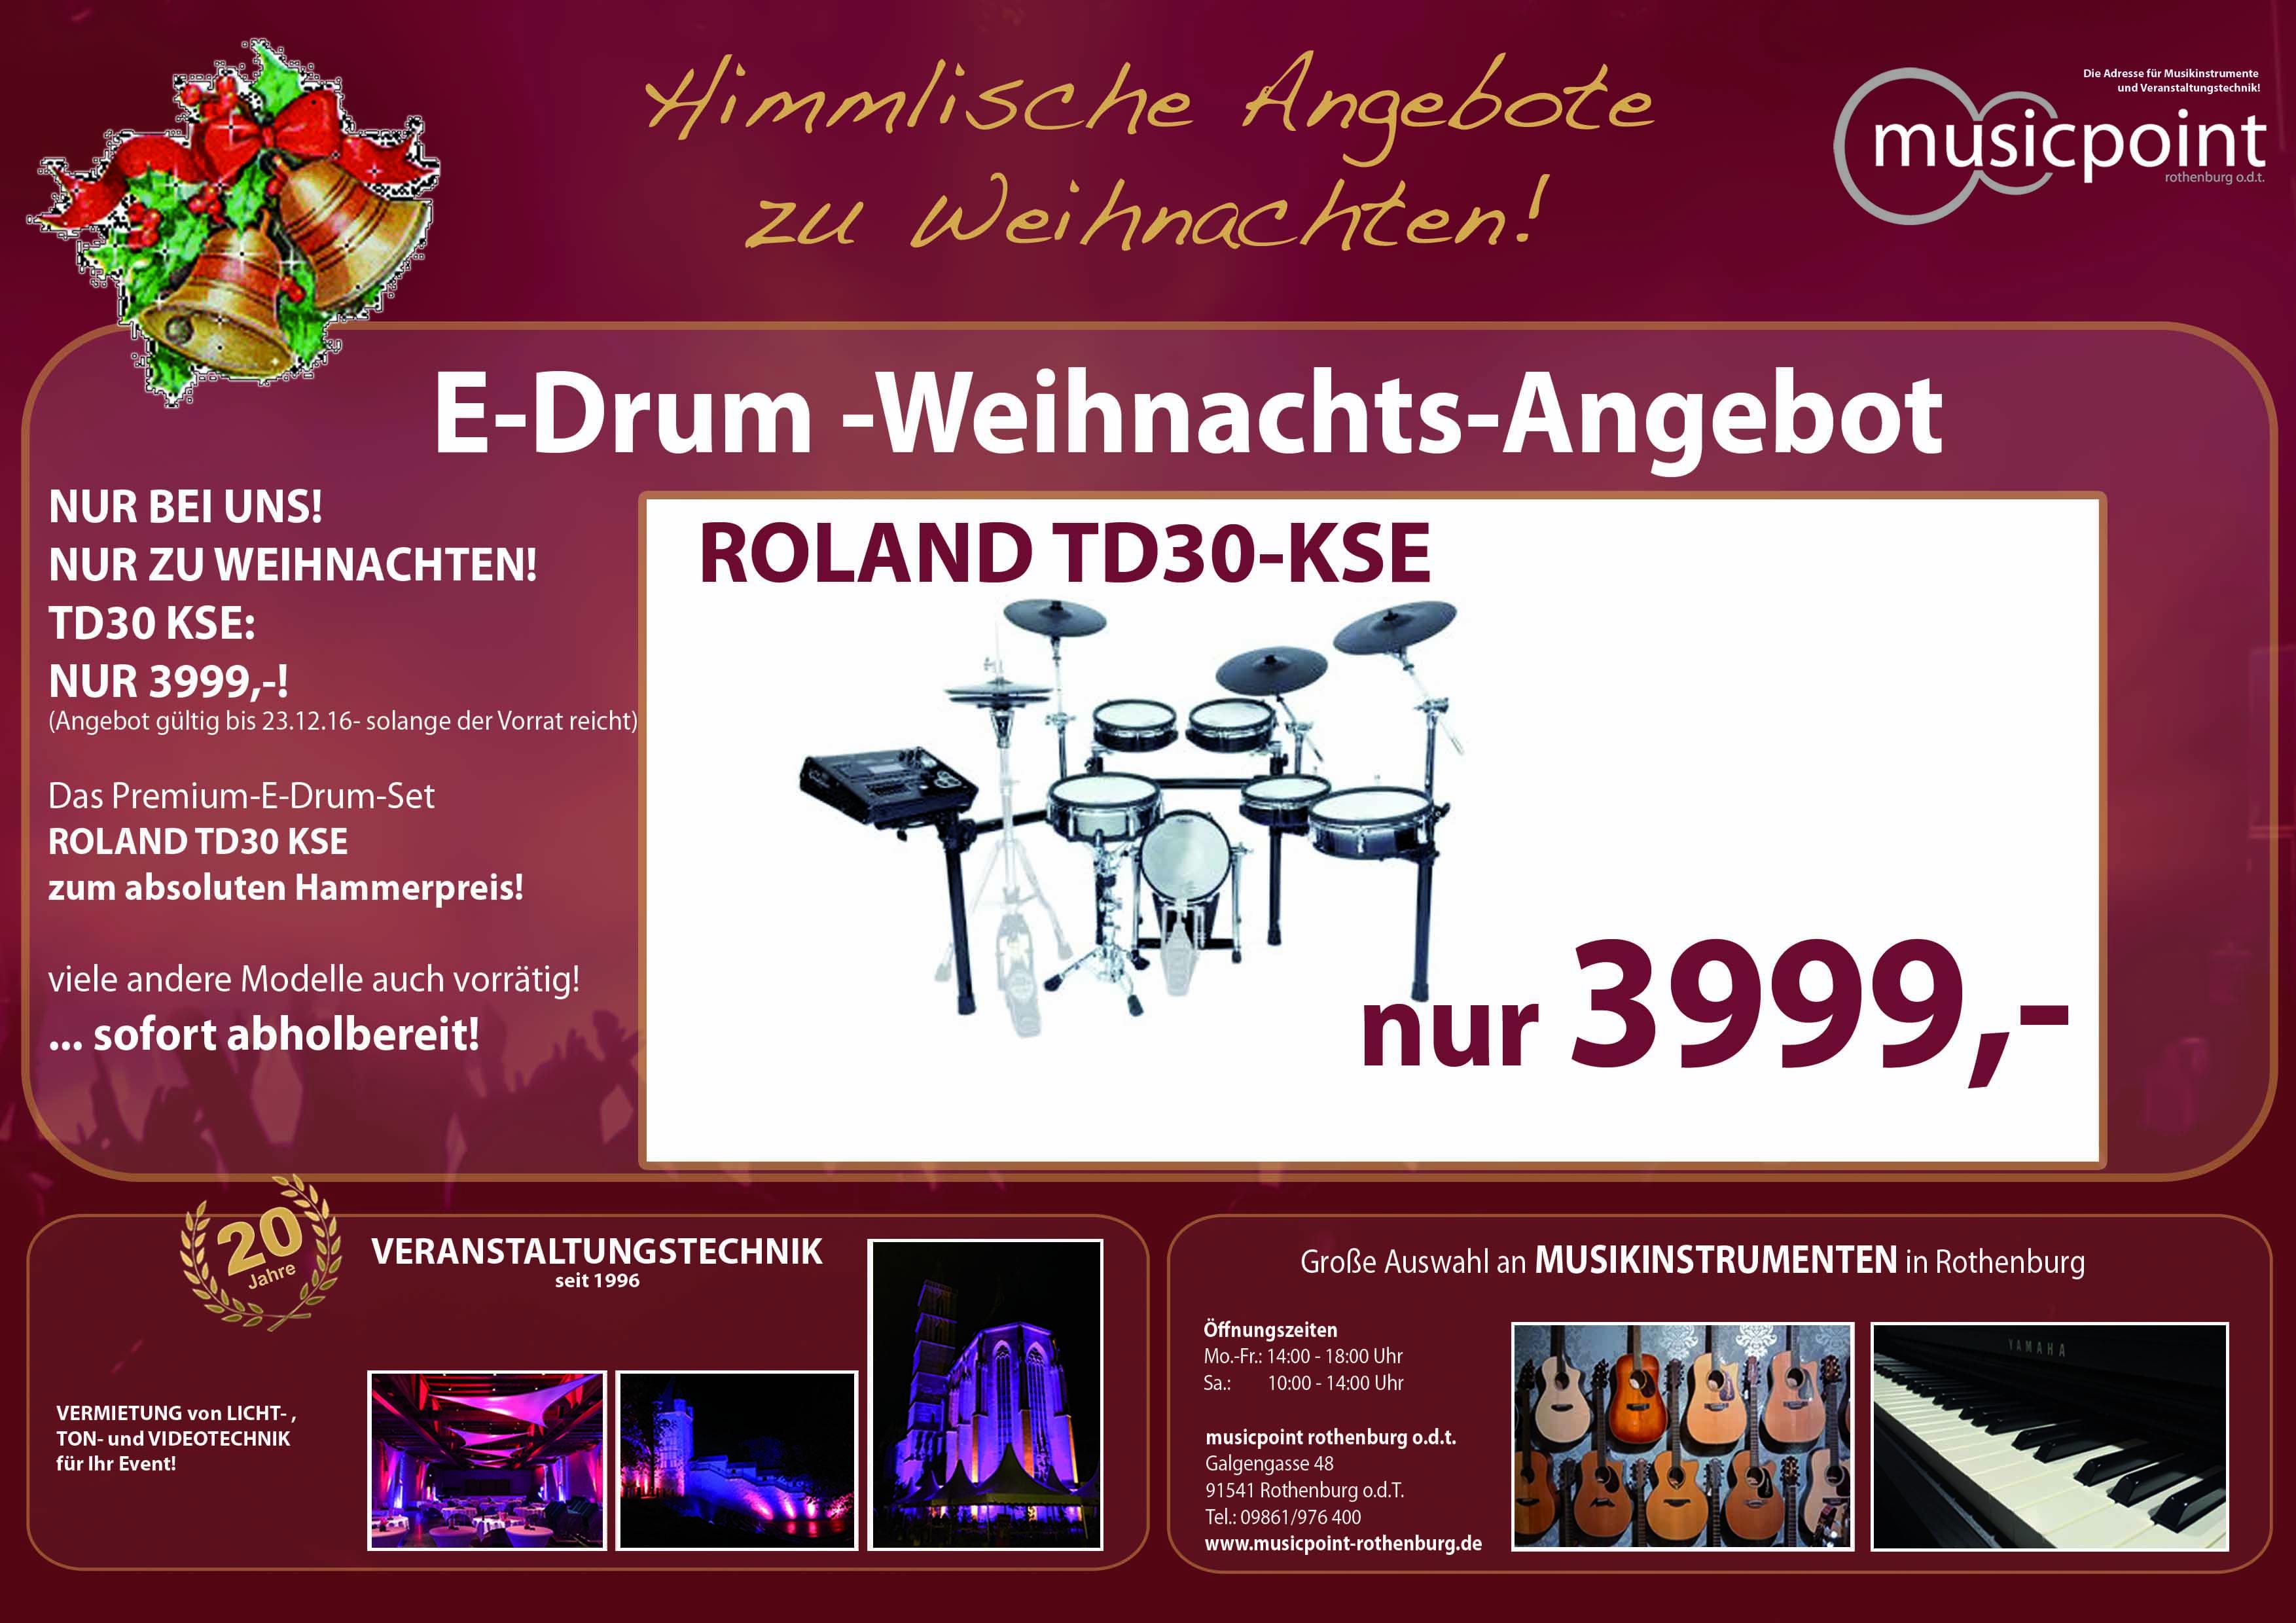 Roland TD 30 KSE